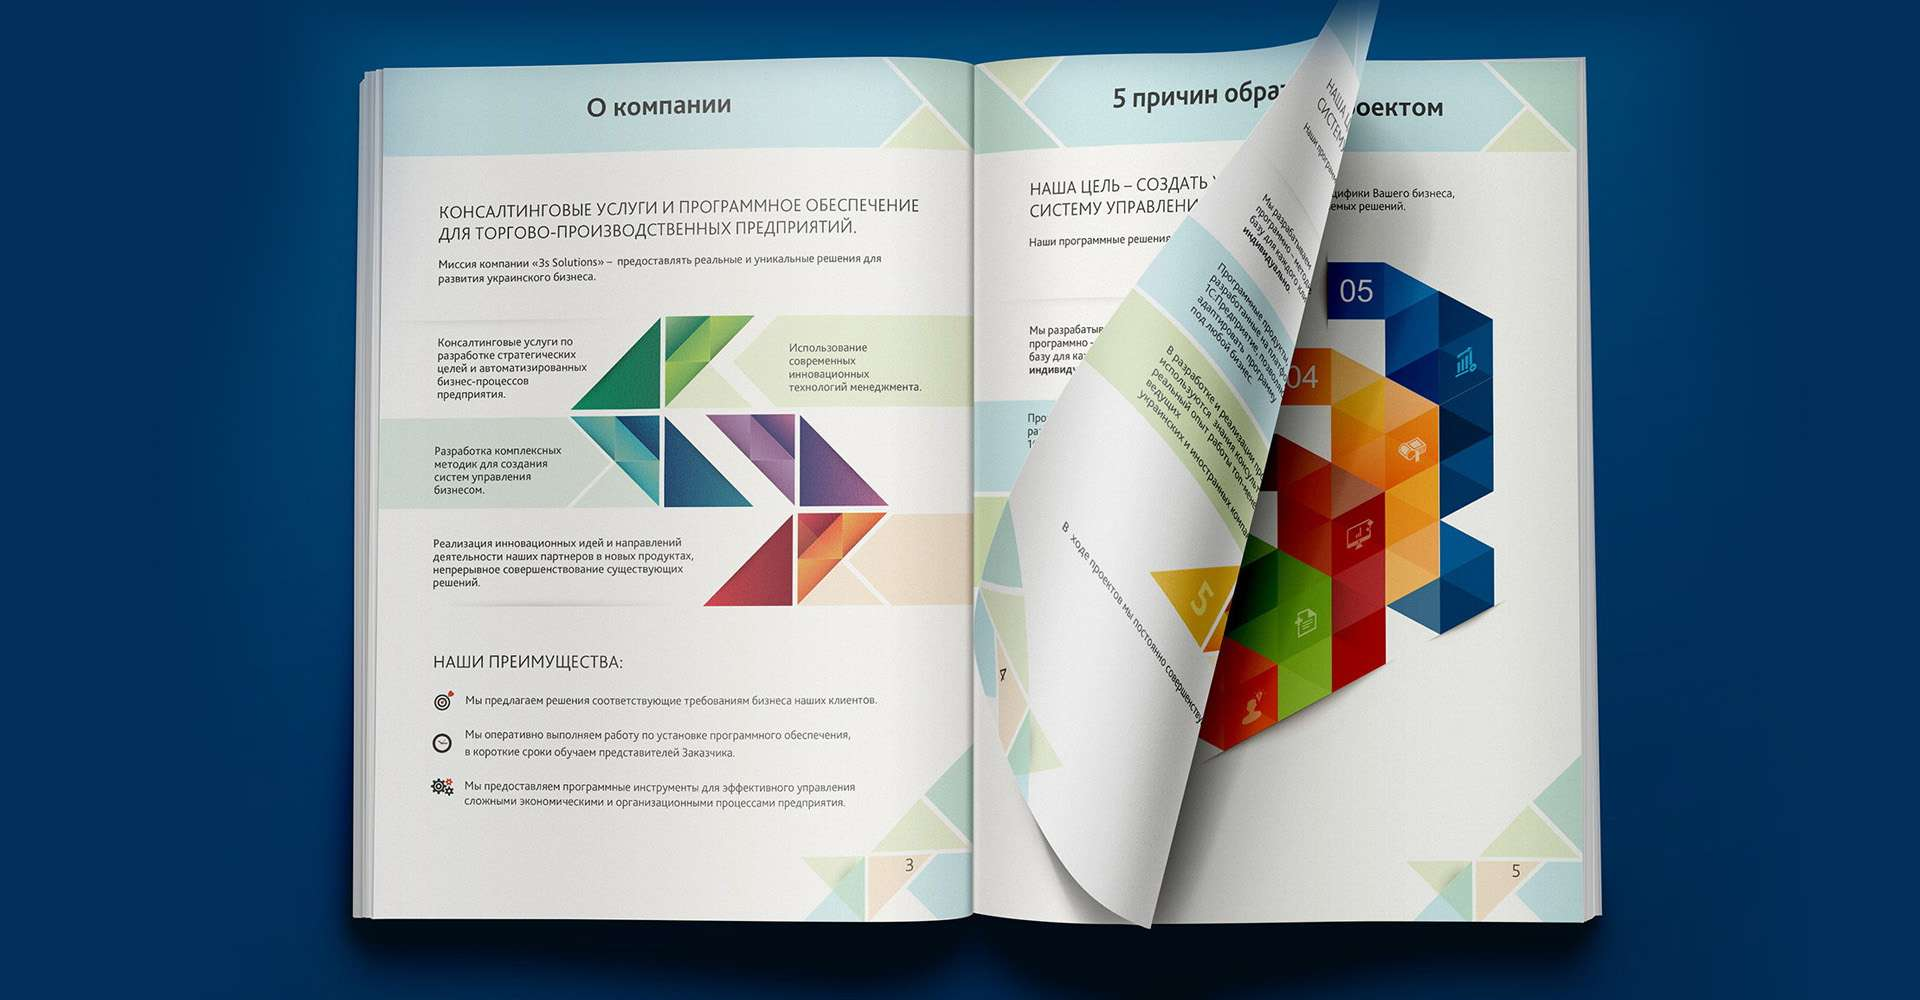 Разработка презентации компании, PDF презентации, создание Power Point | Keynote презентации. Анимированные WEB презентации